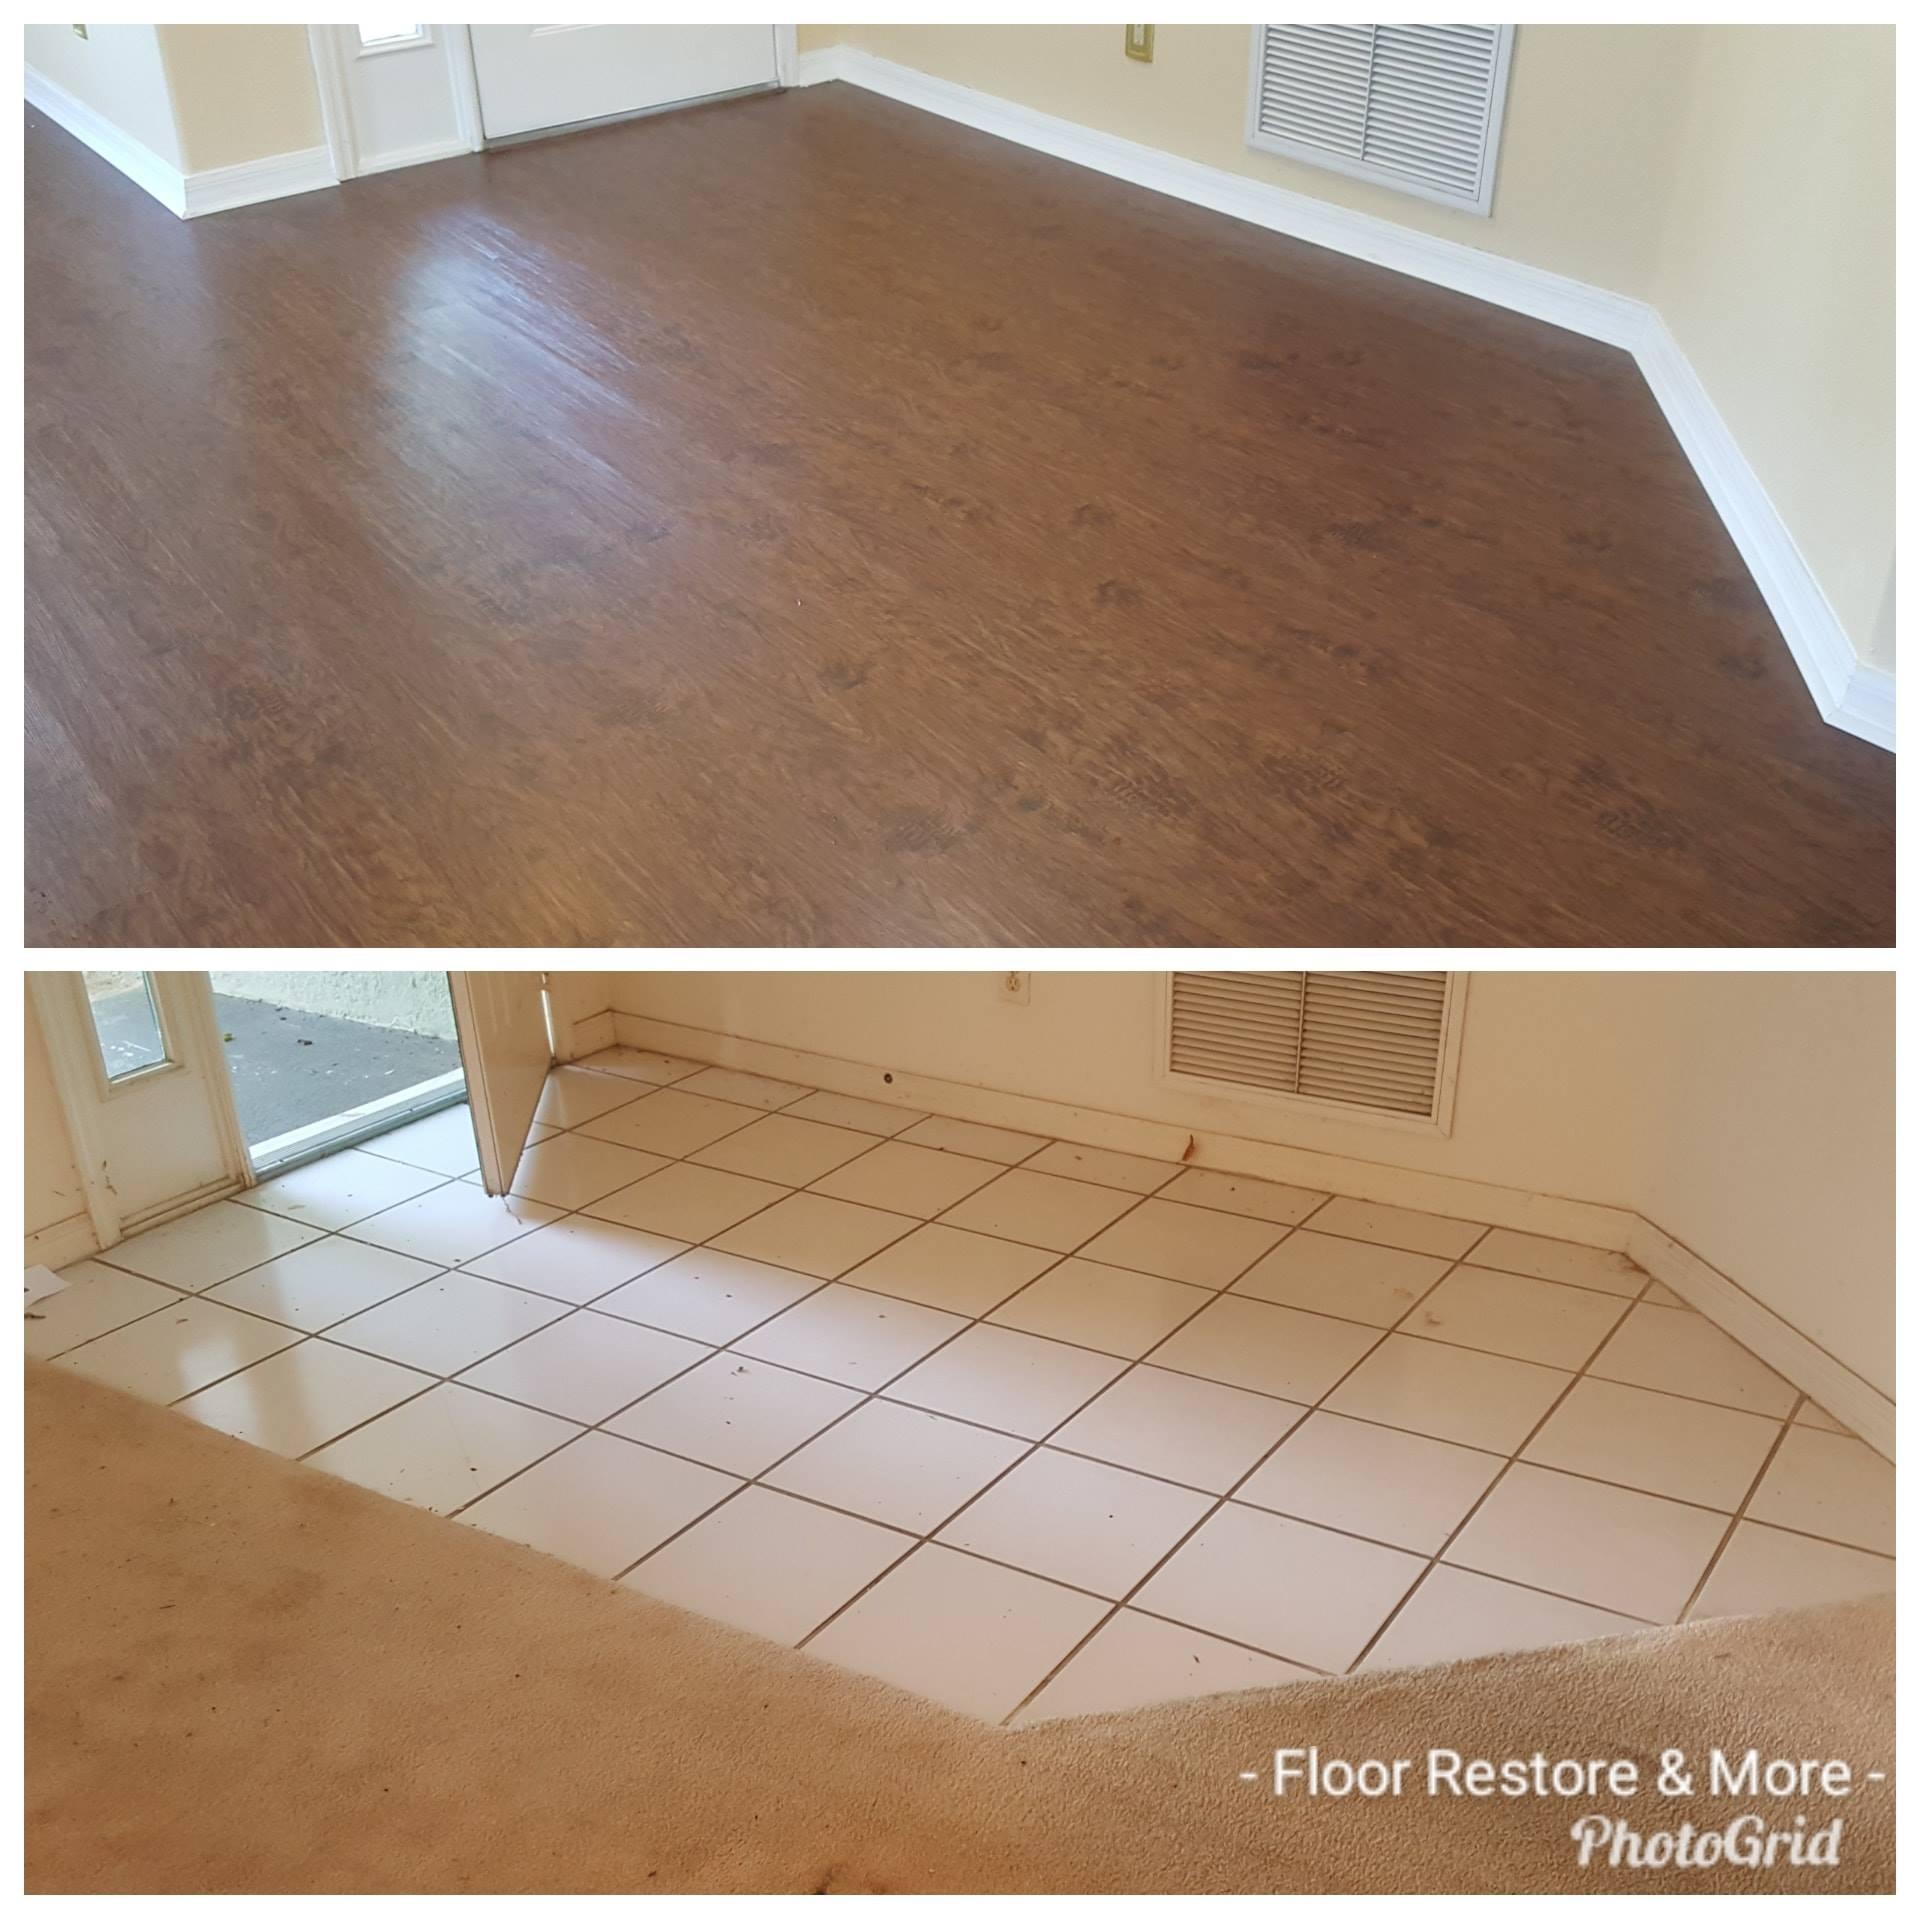 Floor Restore & More   Flooring Removal Services in Lakeland